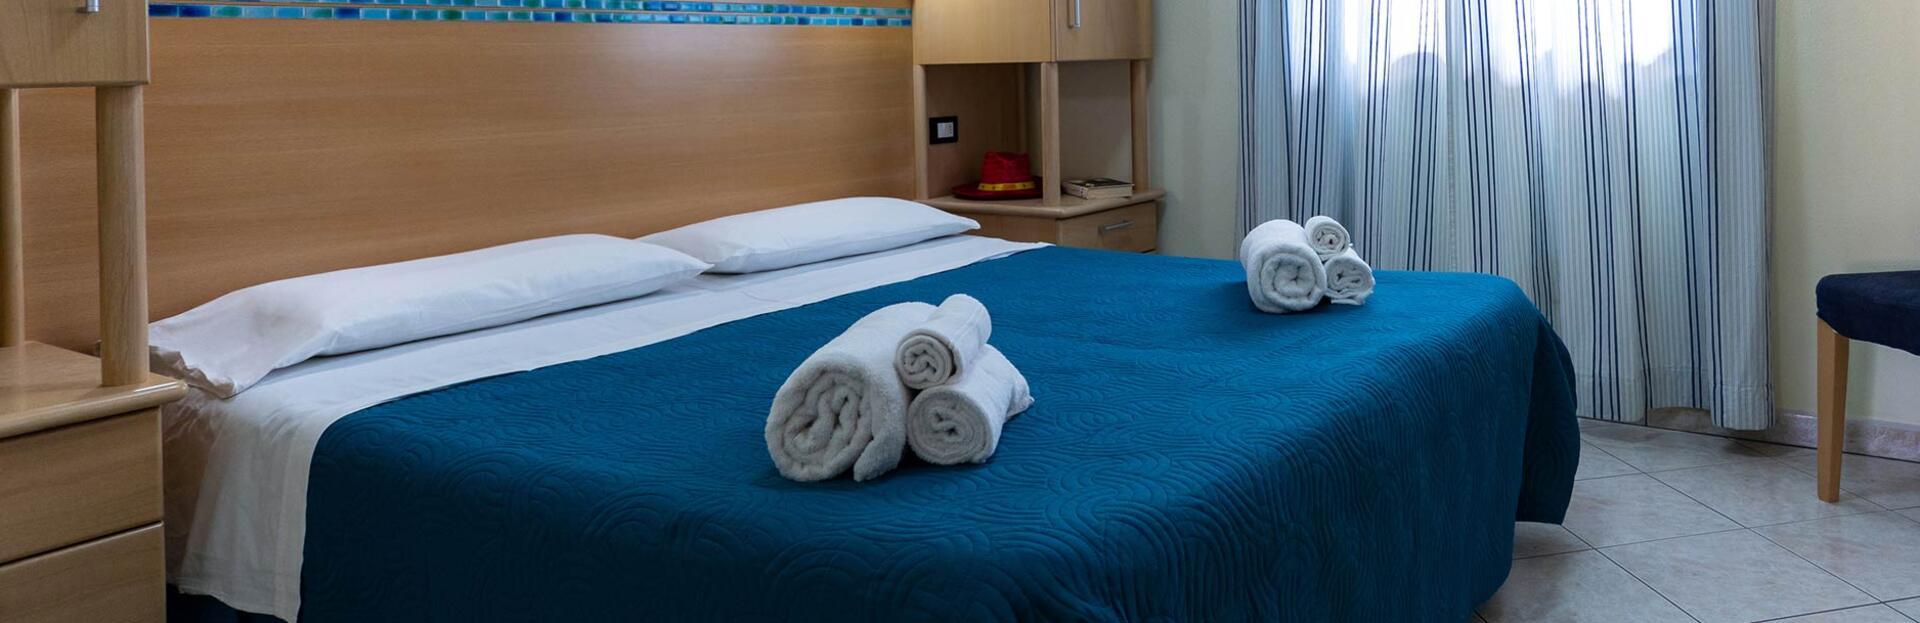 rivieracalabra en two-room-apartments 009